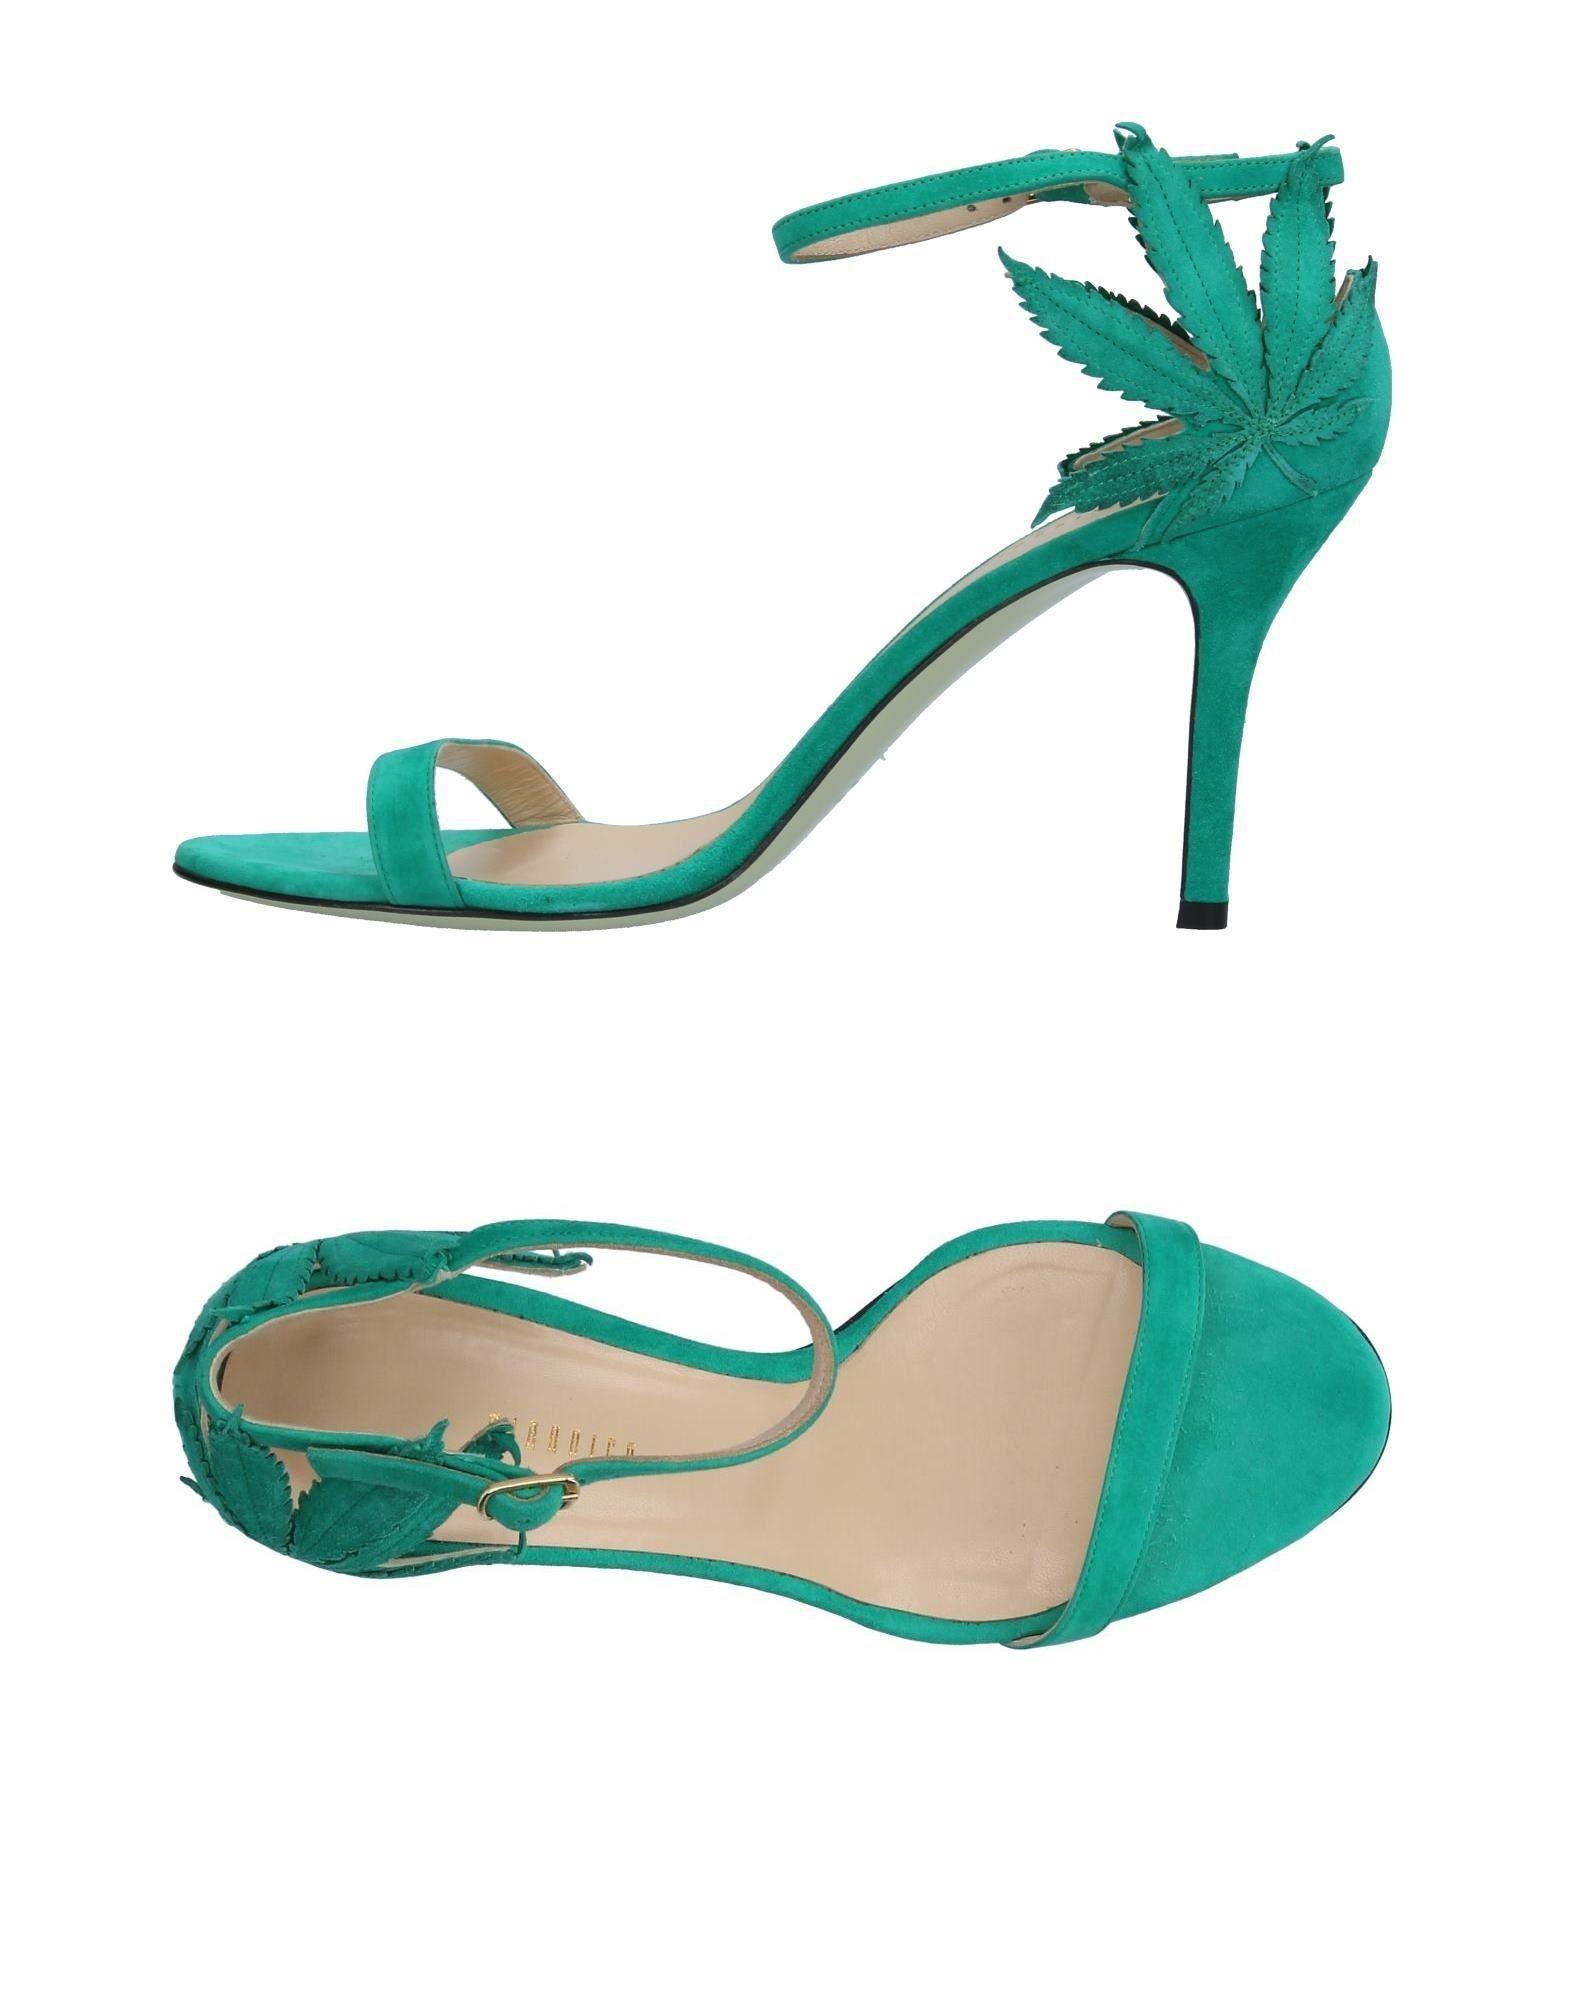 GIANNICO Damen Sandale Farbe Grün Größe 13 - broschei